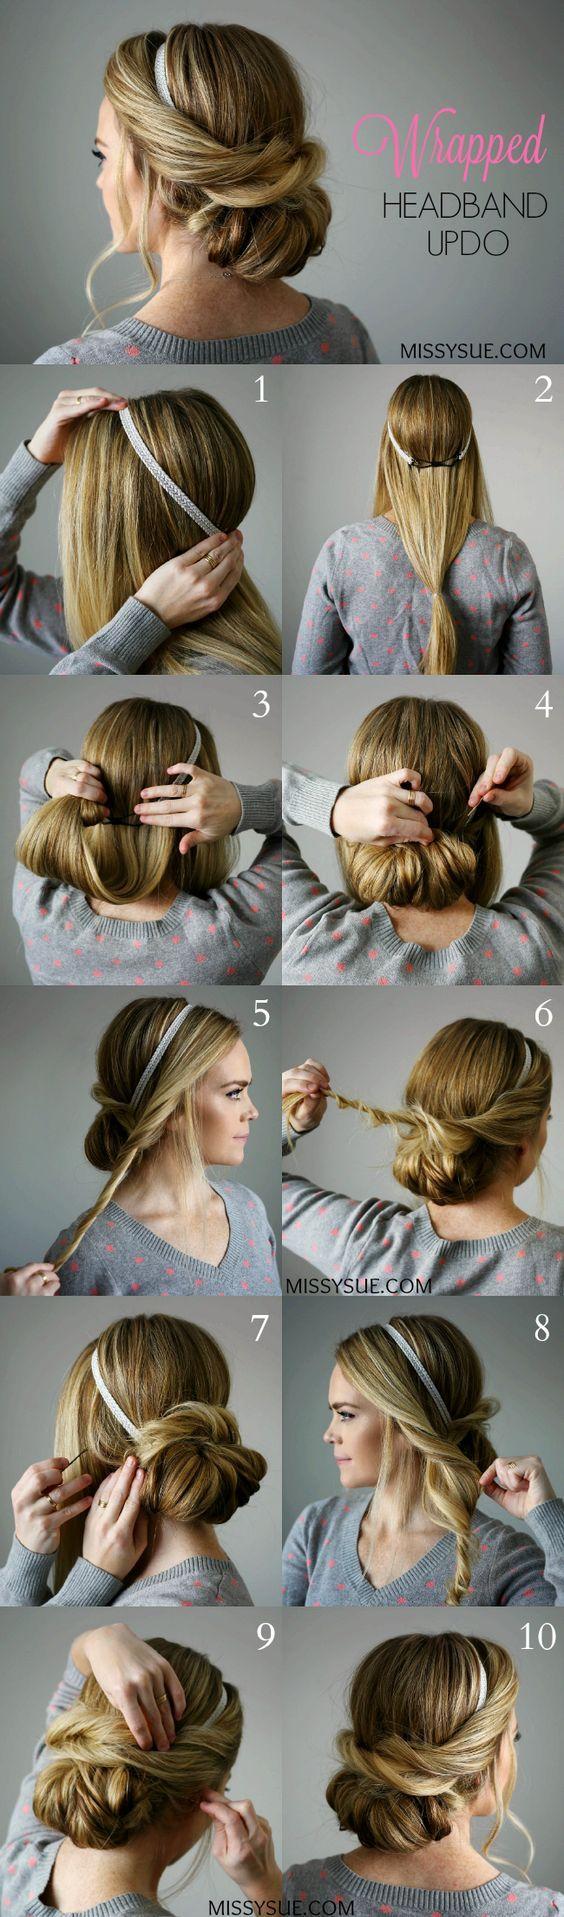 best 25+ simple hairdos ideas on pinterest | diy hairstyles, easy